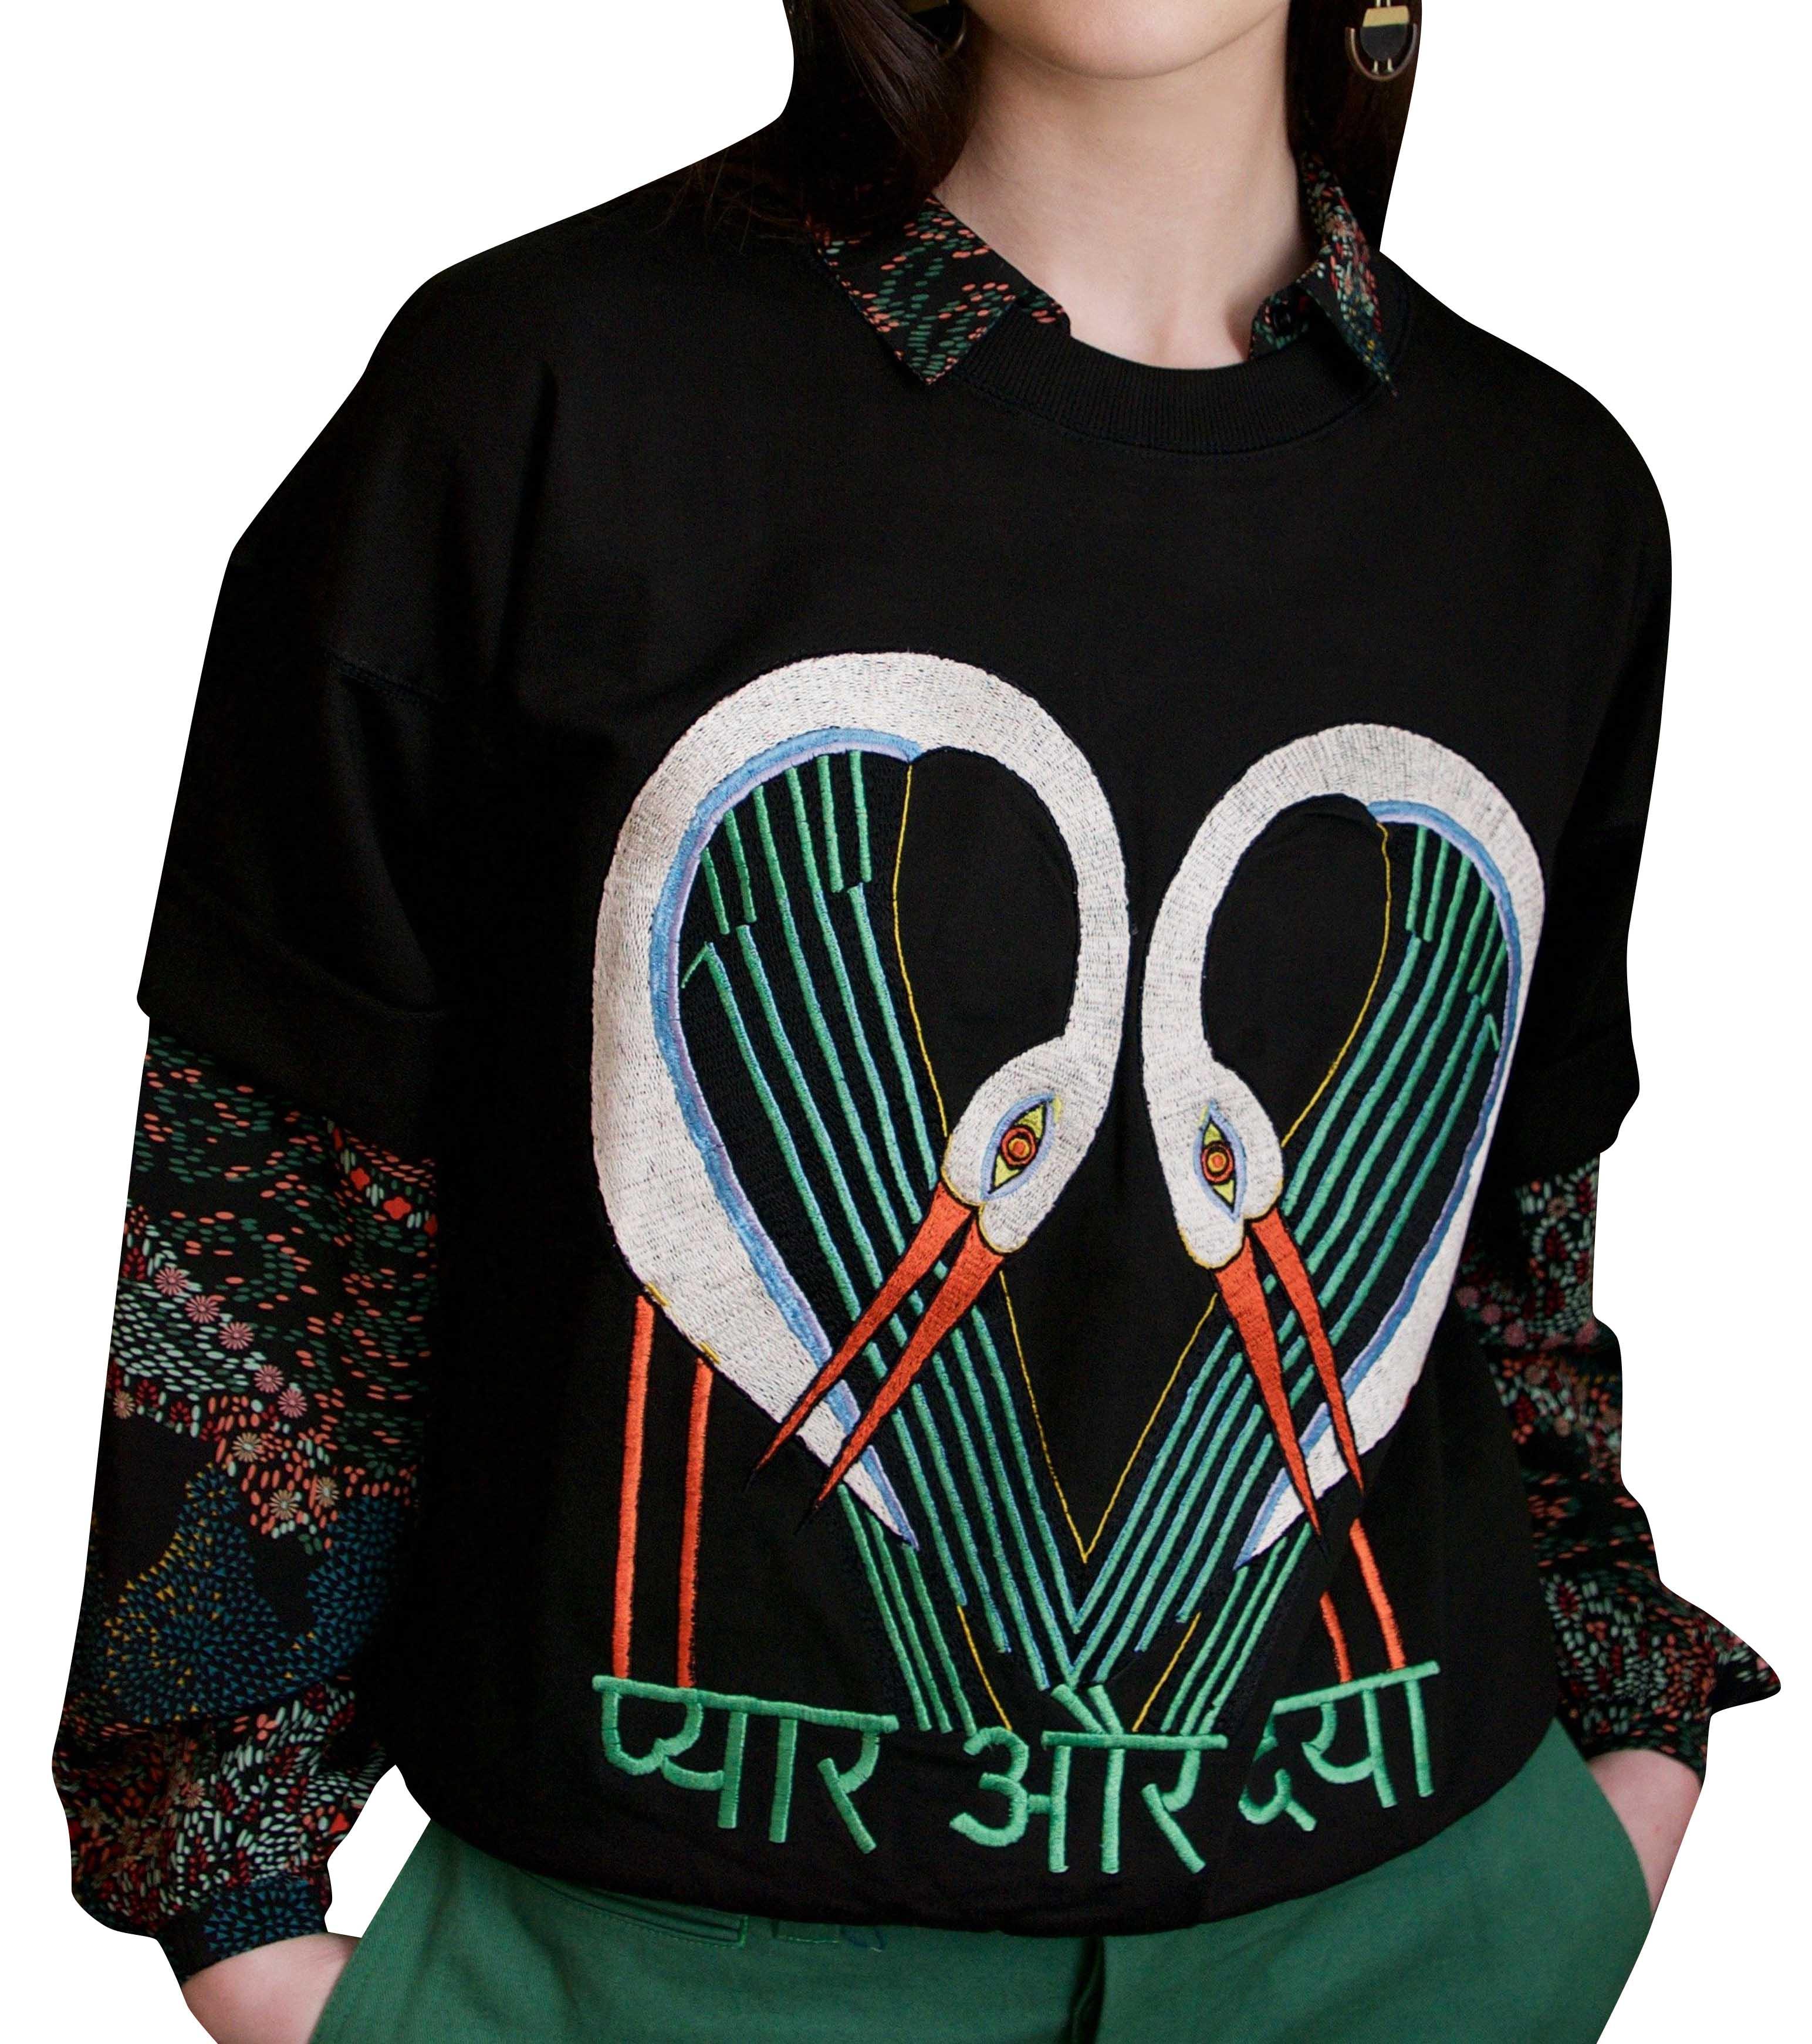 Short Sleeve sweatshirt Black storks by Tallulah & Hope - 1